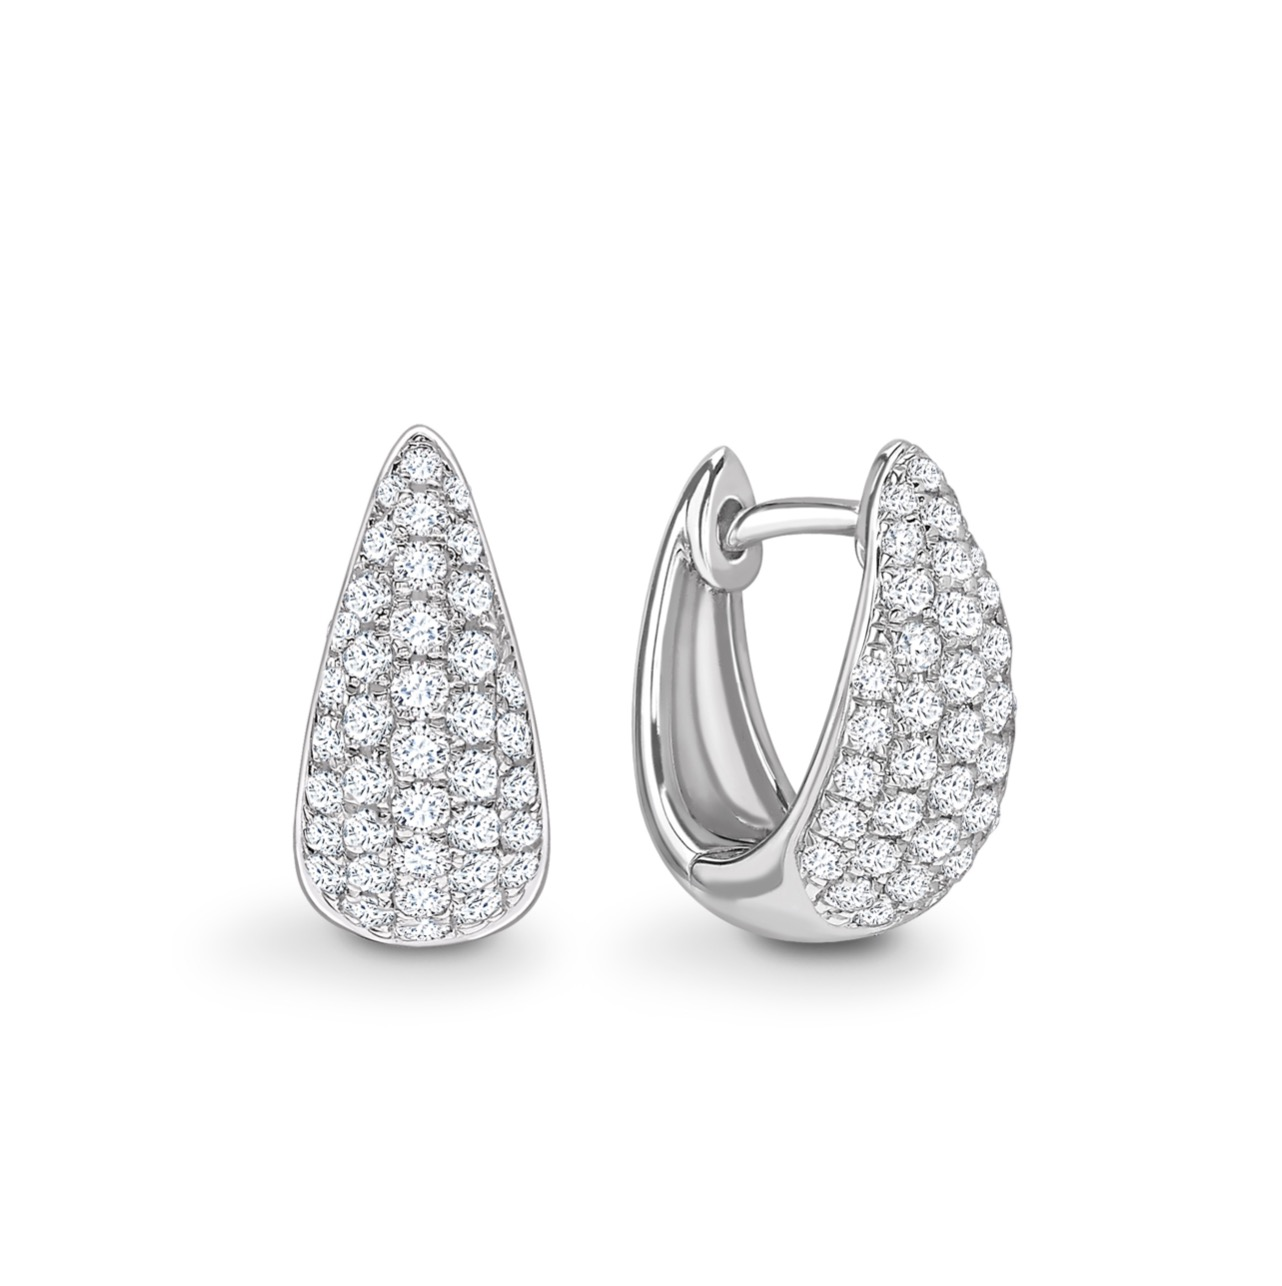 Valonia-earrings